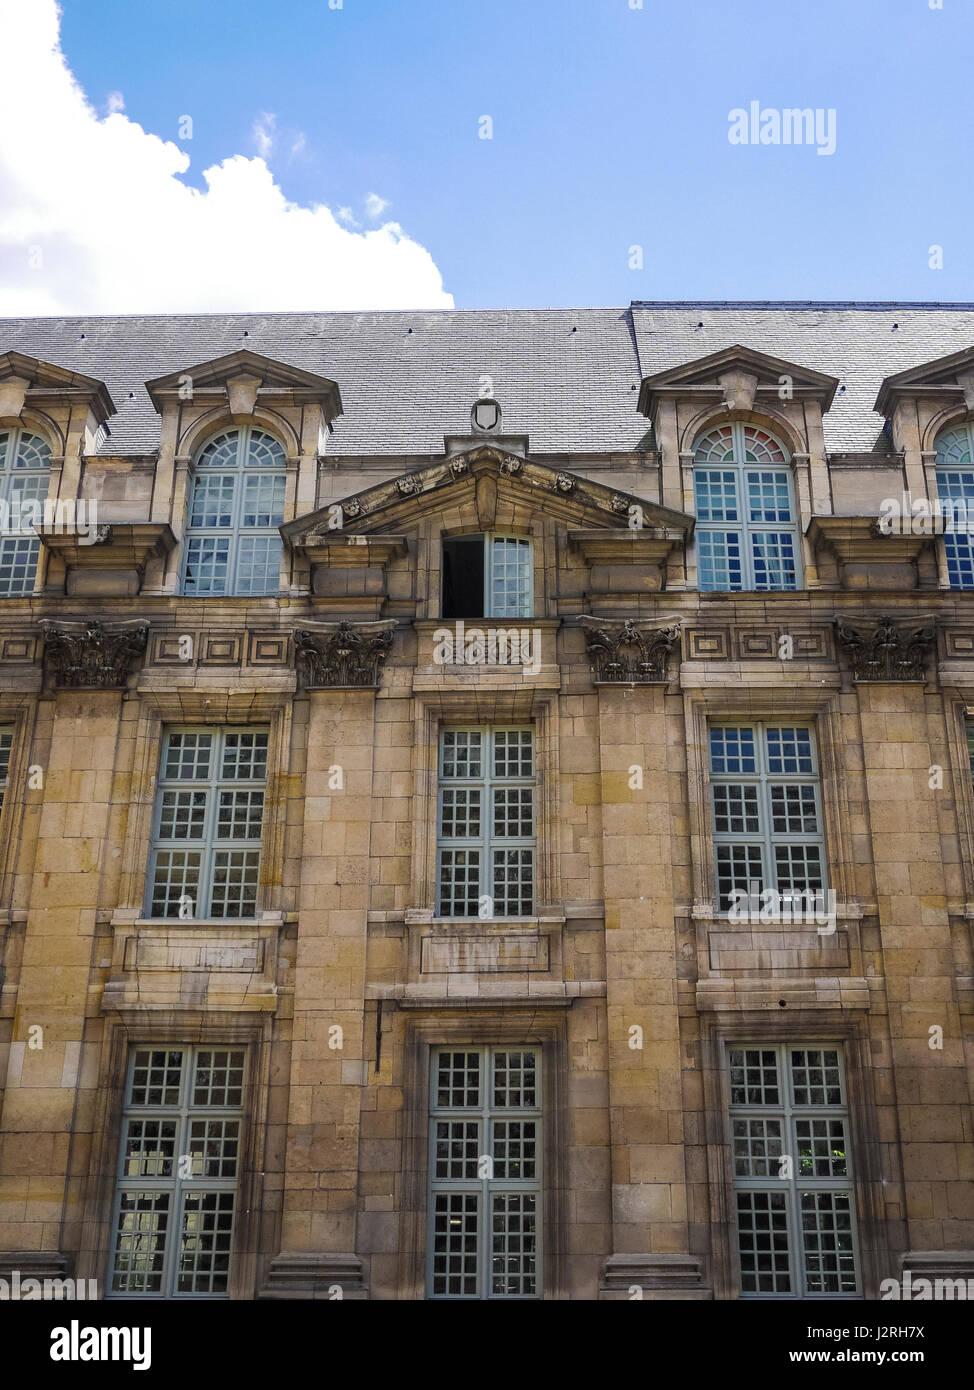 Musee Carnavalet, in the Marais neighborhood of Paris, France - Stock Image